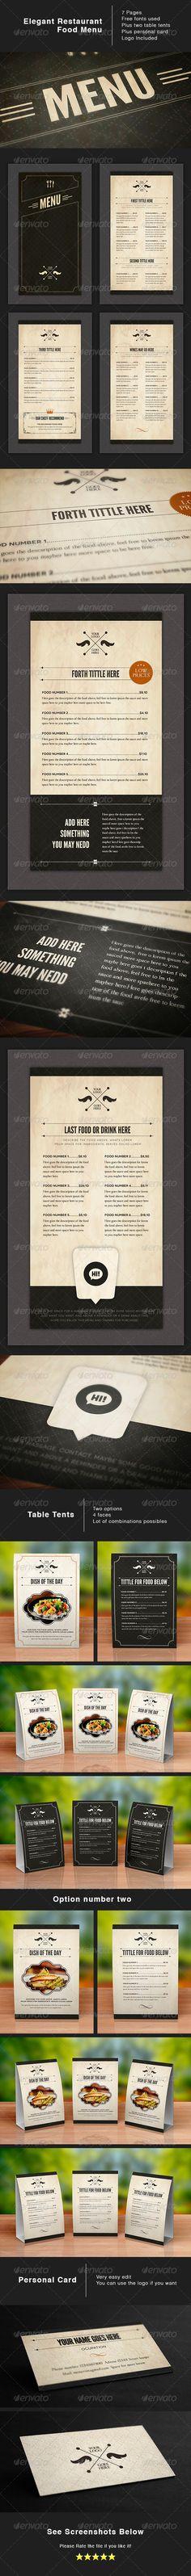 Design Food Stationery - GraphicRiver Item for Sale… new yorks kids only restaurant menu designed by caden, ricky, haley, cooper, henry, alida, and the hatch children